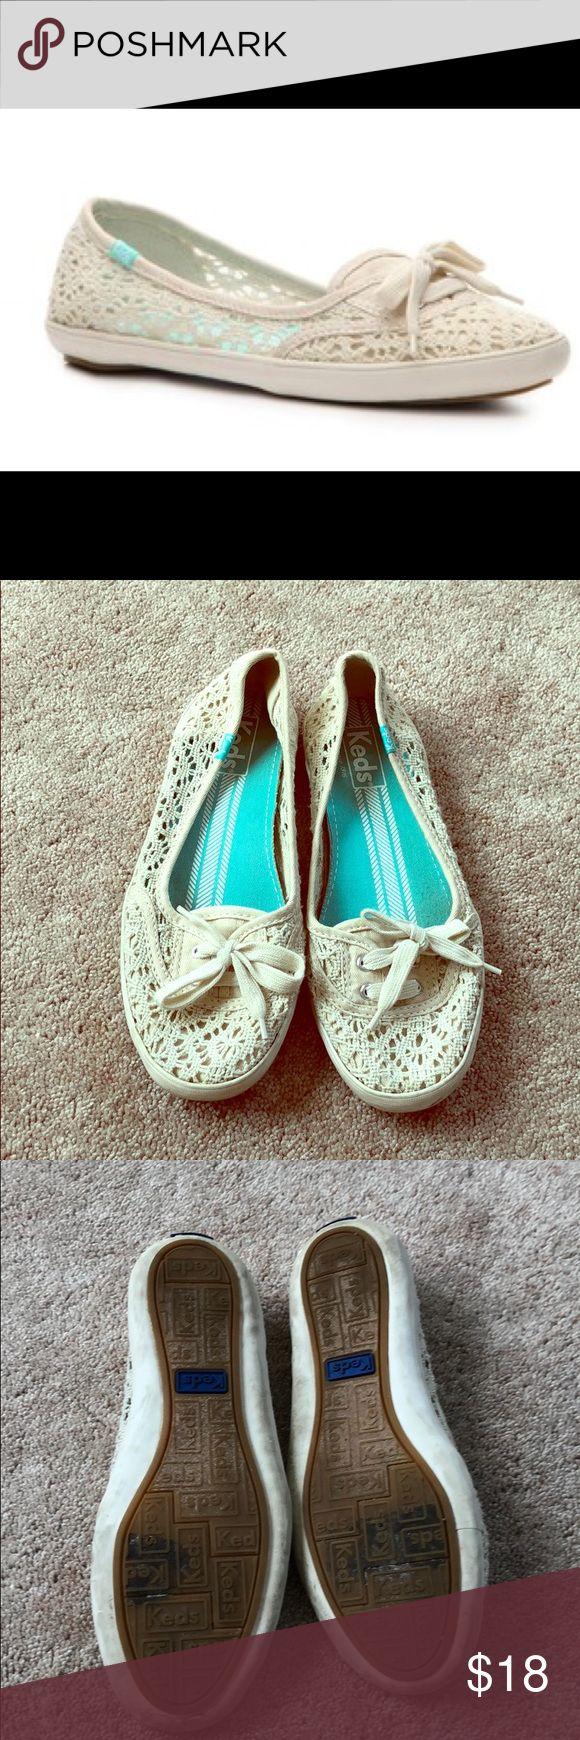 Keds Teacup Crochet Slip-on Flat Keds Teacup Crochet Slip-on Flat. Shoe string tie in front. Lightly worn. Keds Shoes Flats & Loafers #sliponshoes